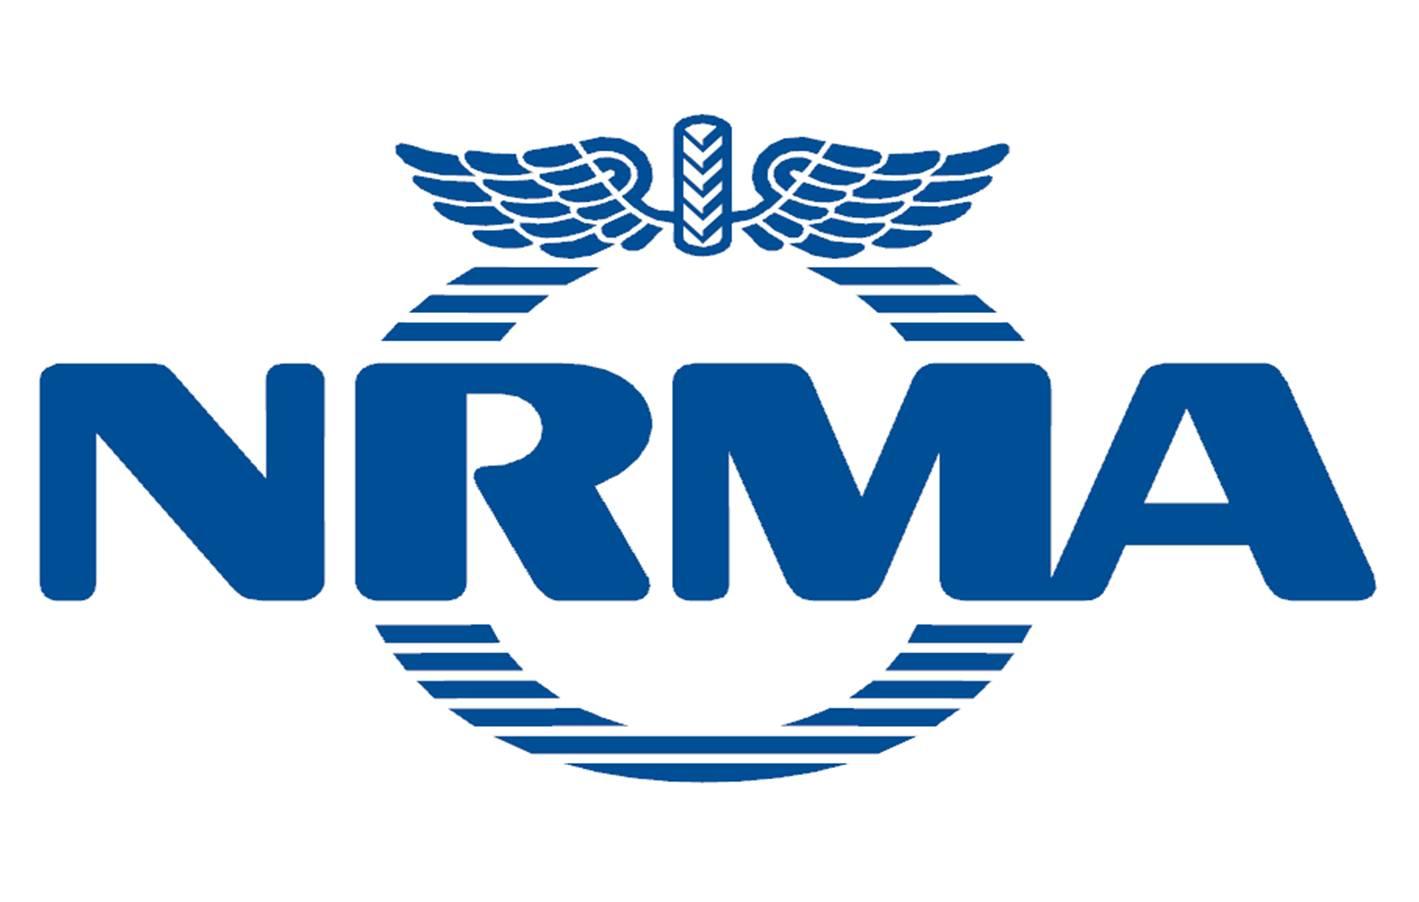 NRMA Logo photo - 1